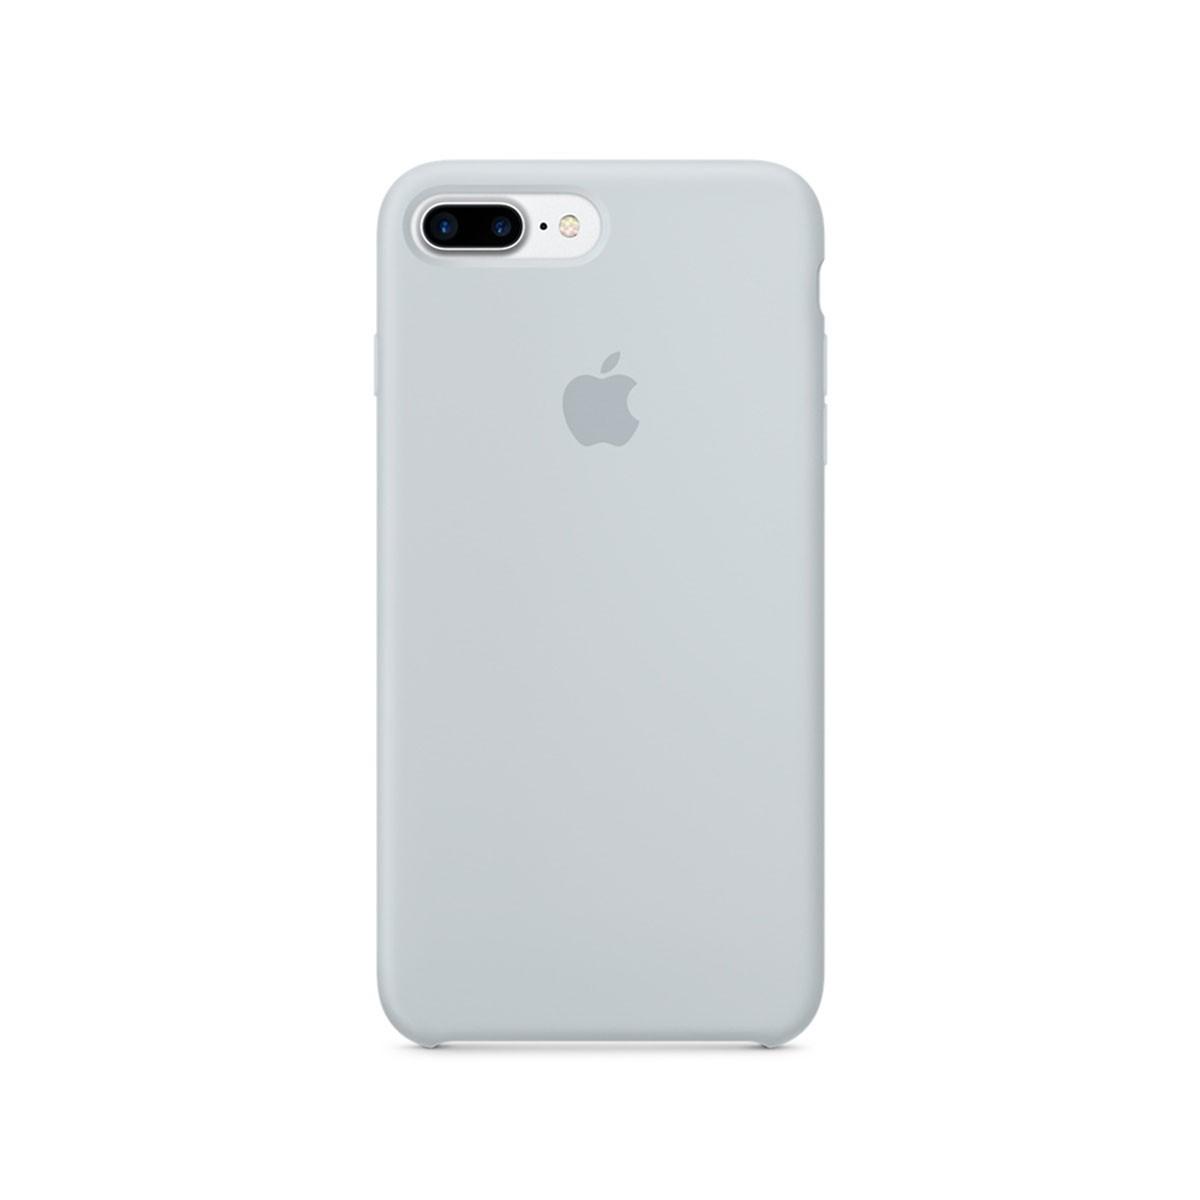 Silikonový kryt na iPhone 7 Plus – mlhově modrý